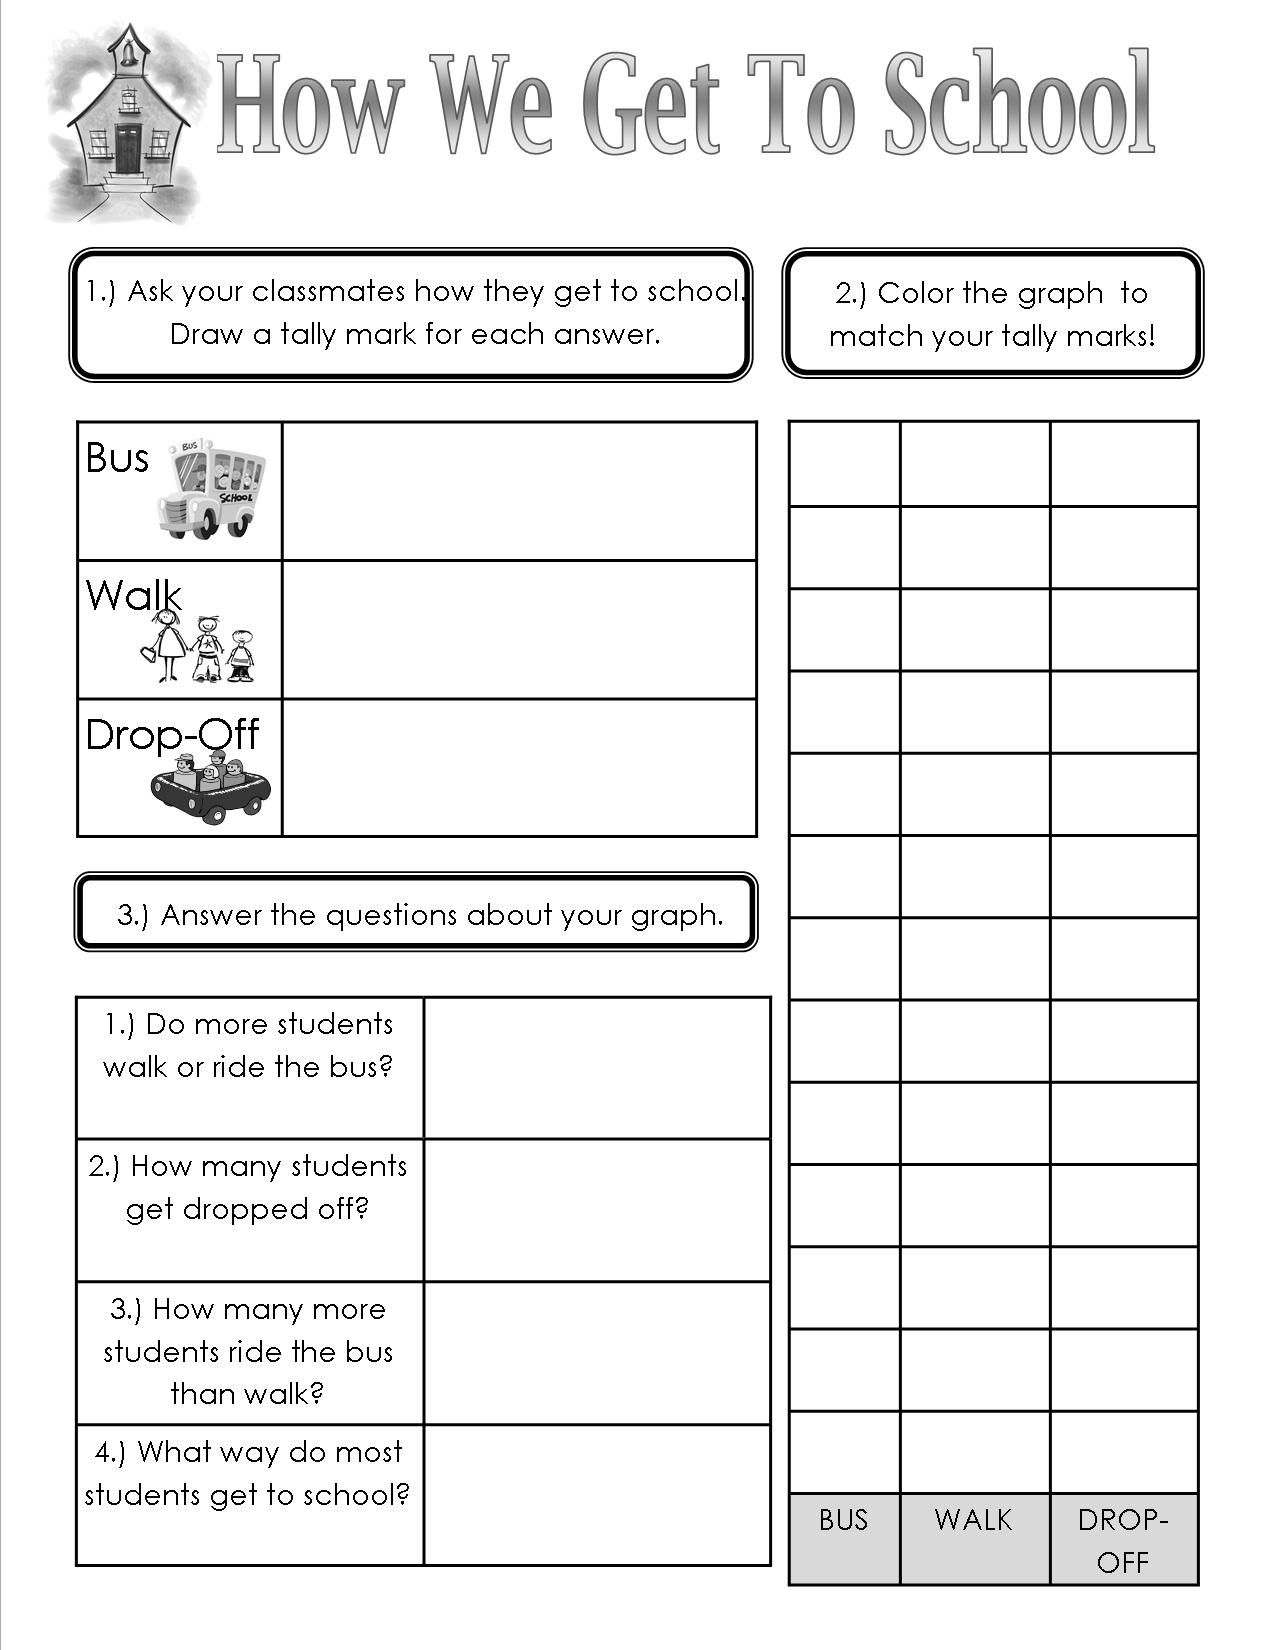 How We Get To School Sheet Teaching Heart Blog Math School Teaching Math Lessons